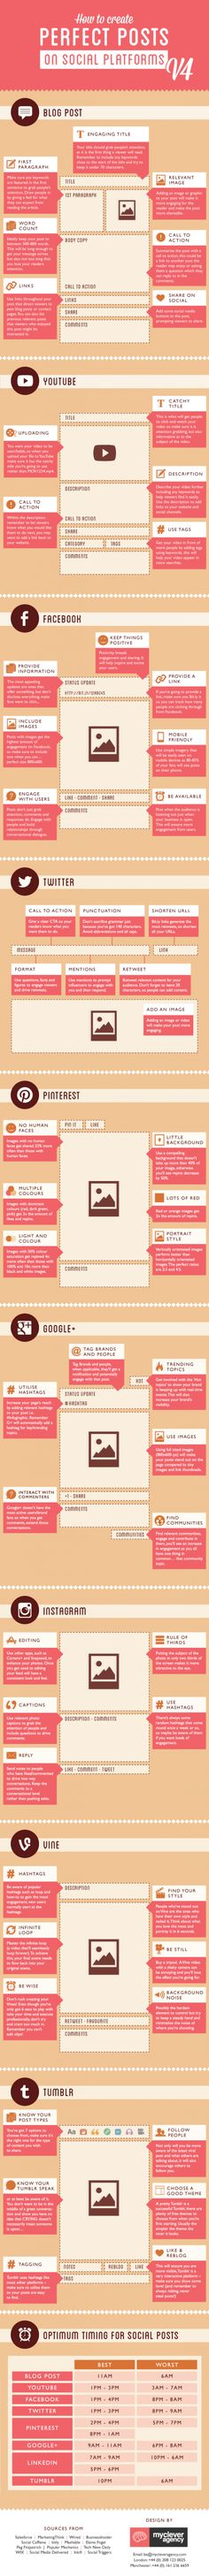 Der perfekte Post für jeden Social-Media-Kanal! [Infografik]